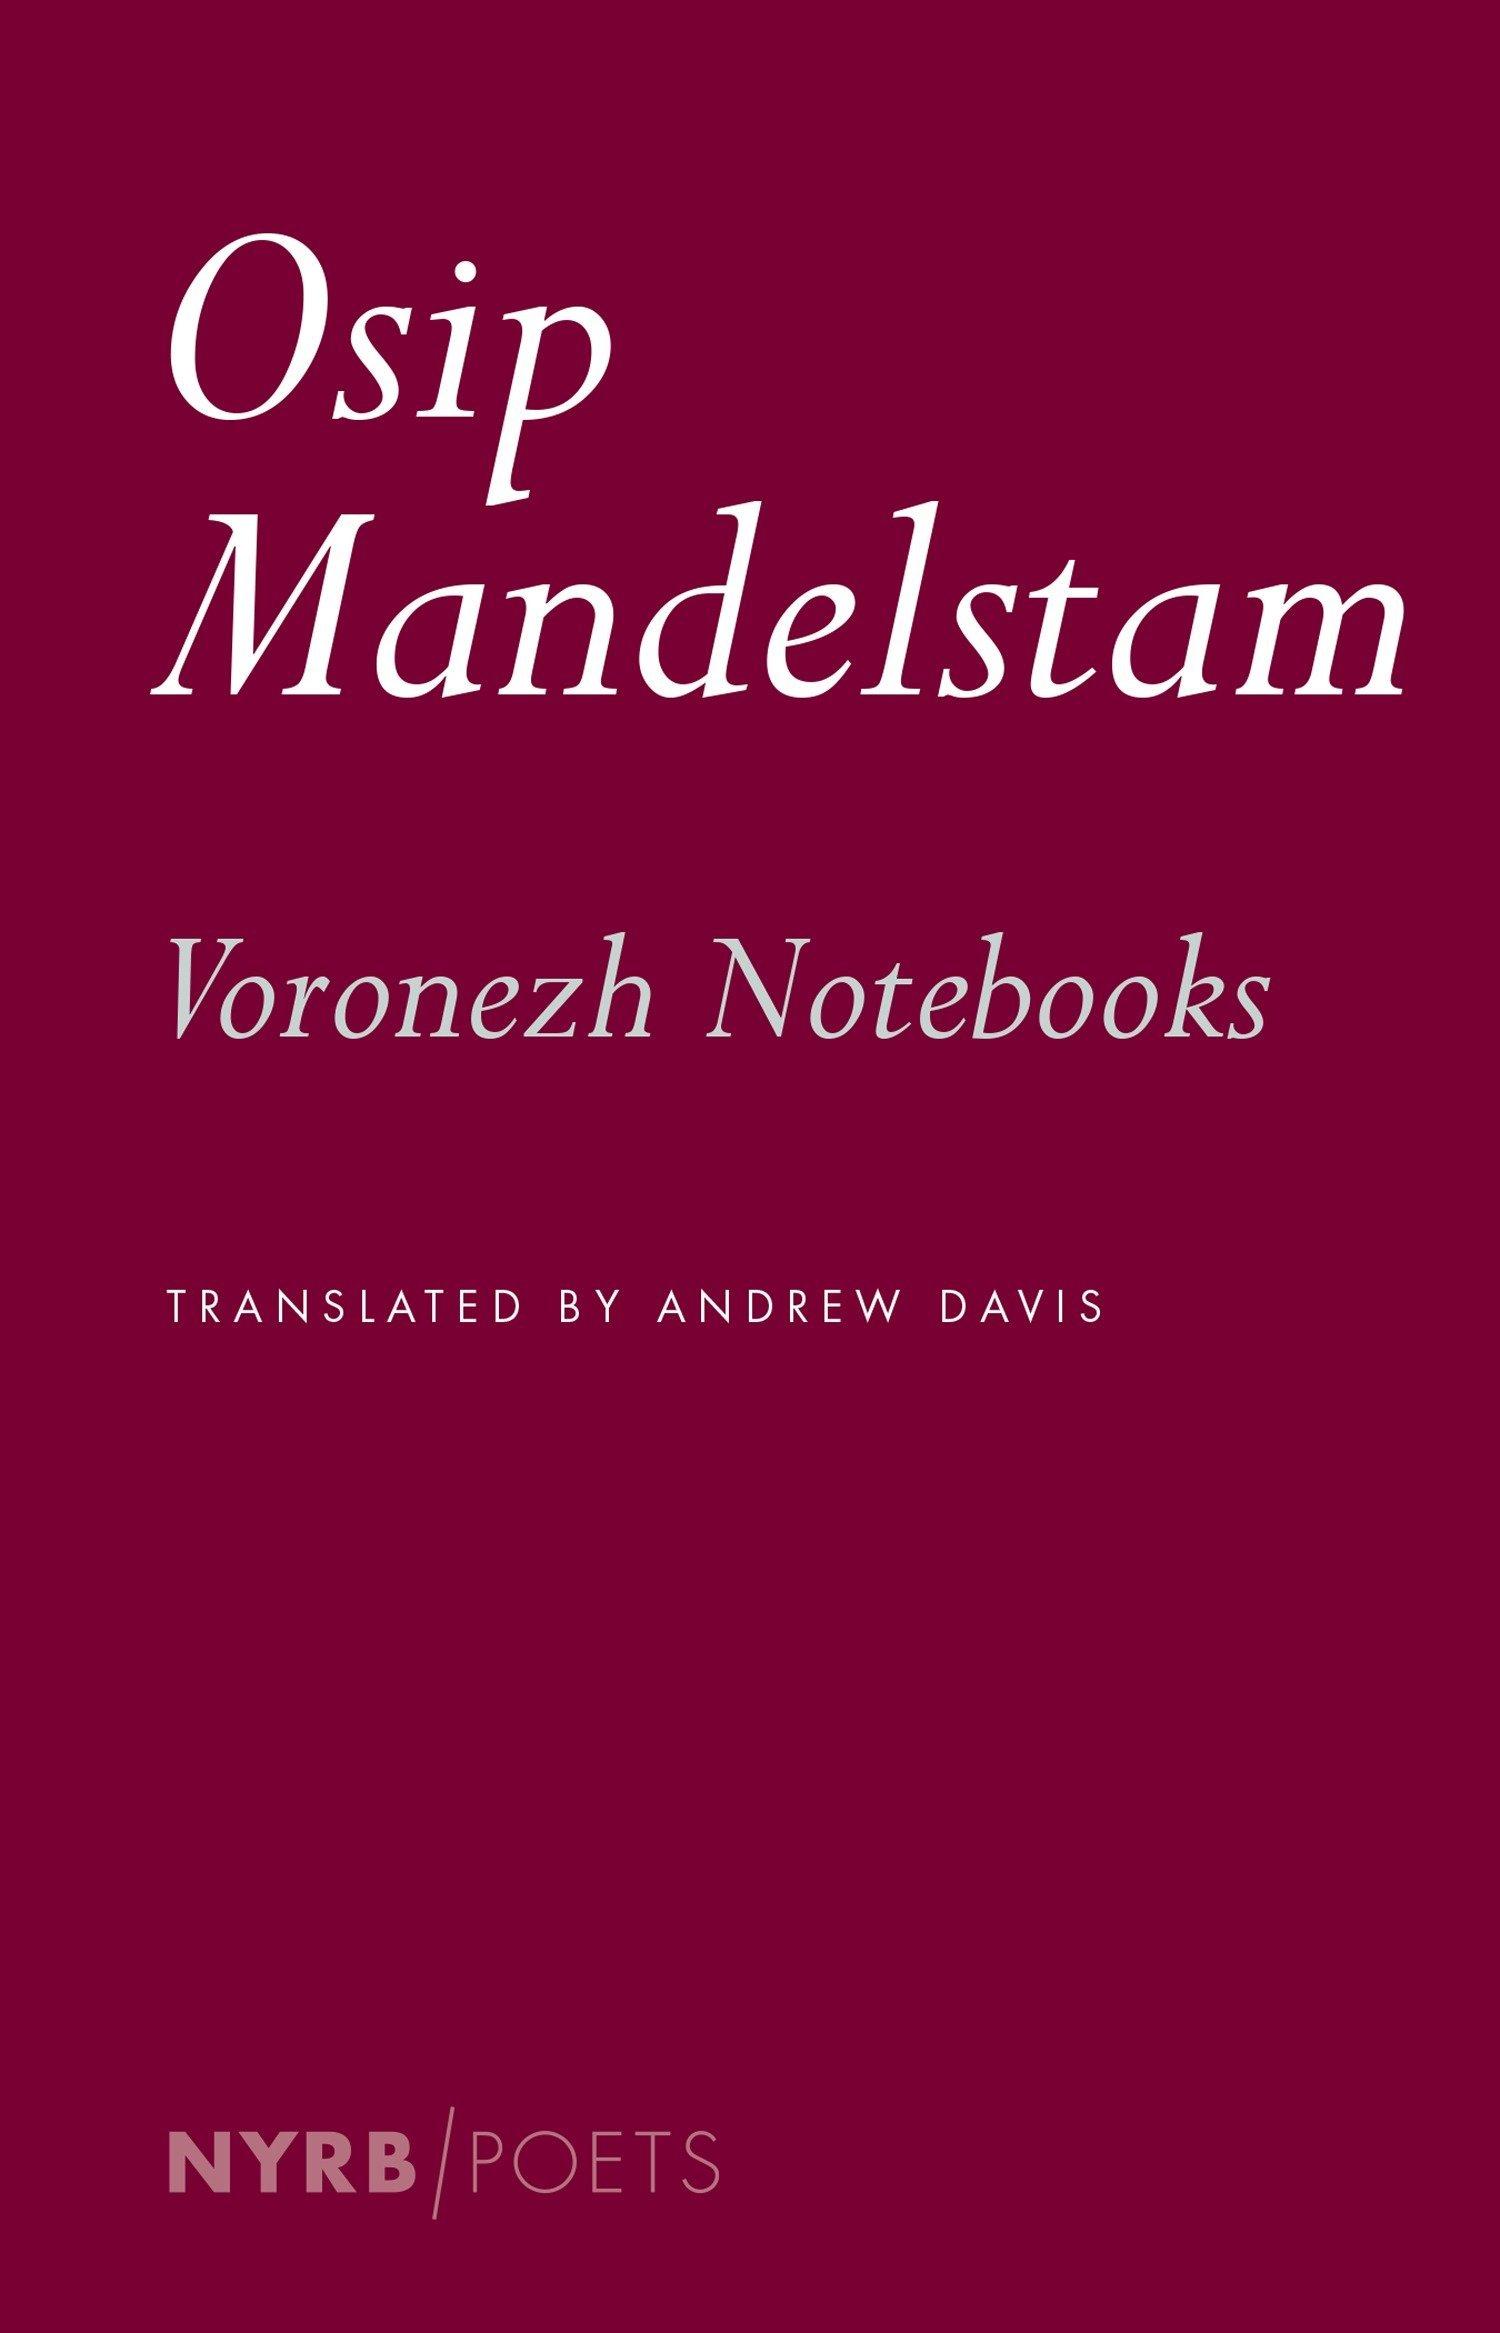 Download Voronezh Notebooks (NYRB Poets) ebook